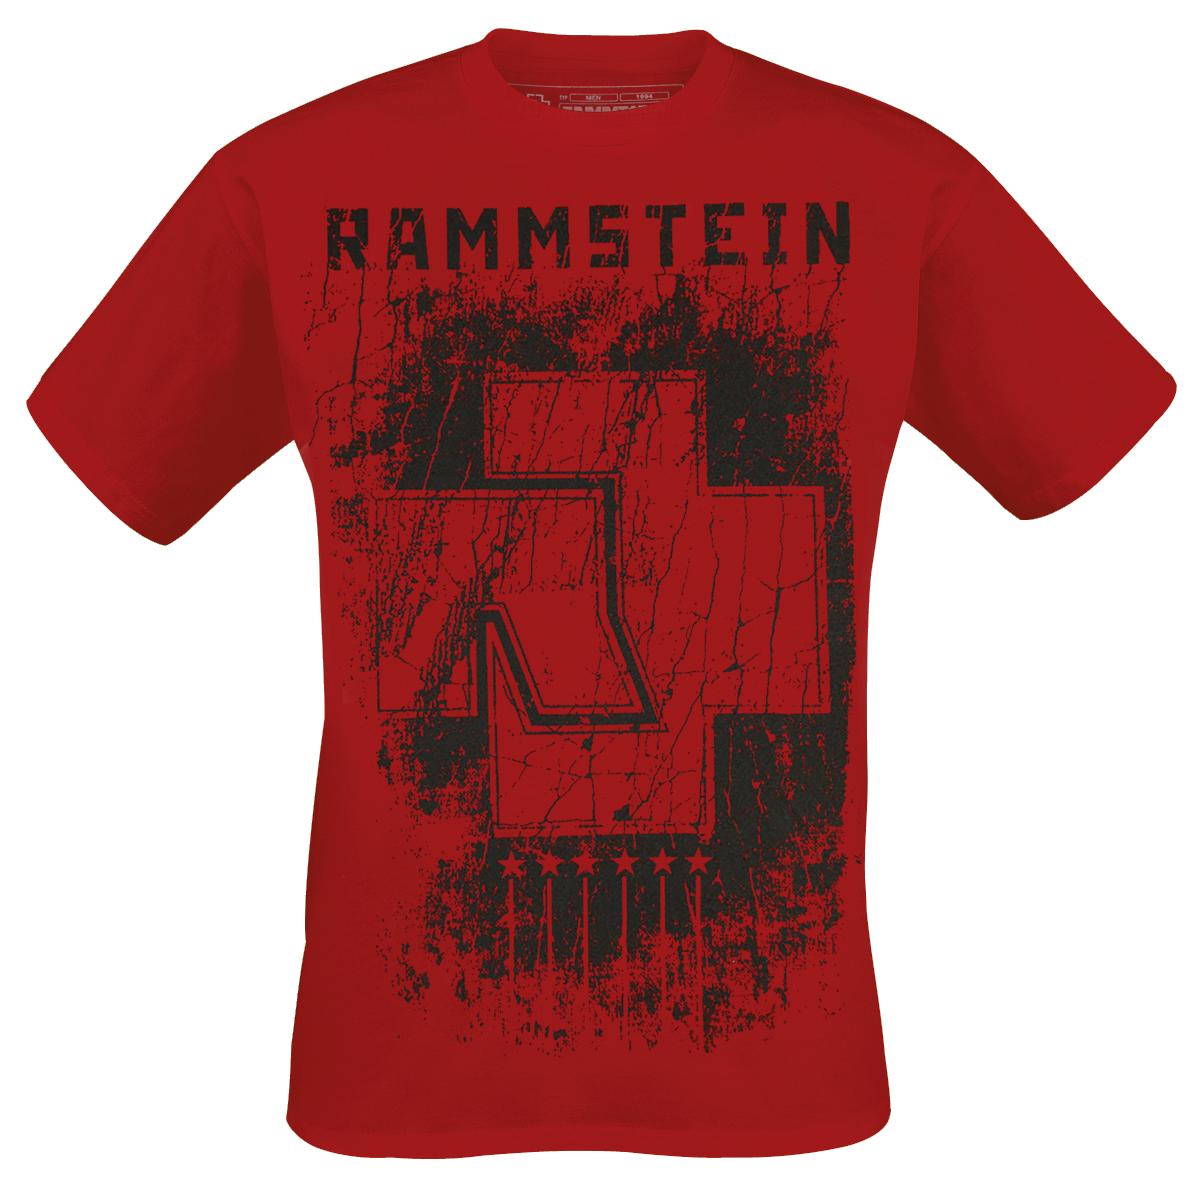 Rammstein - 6 Herzen - T-Shirt - red image